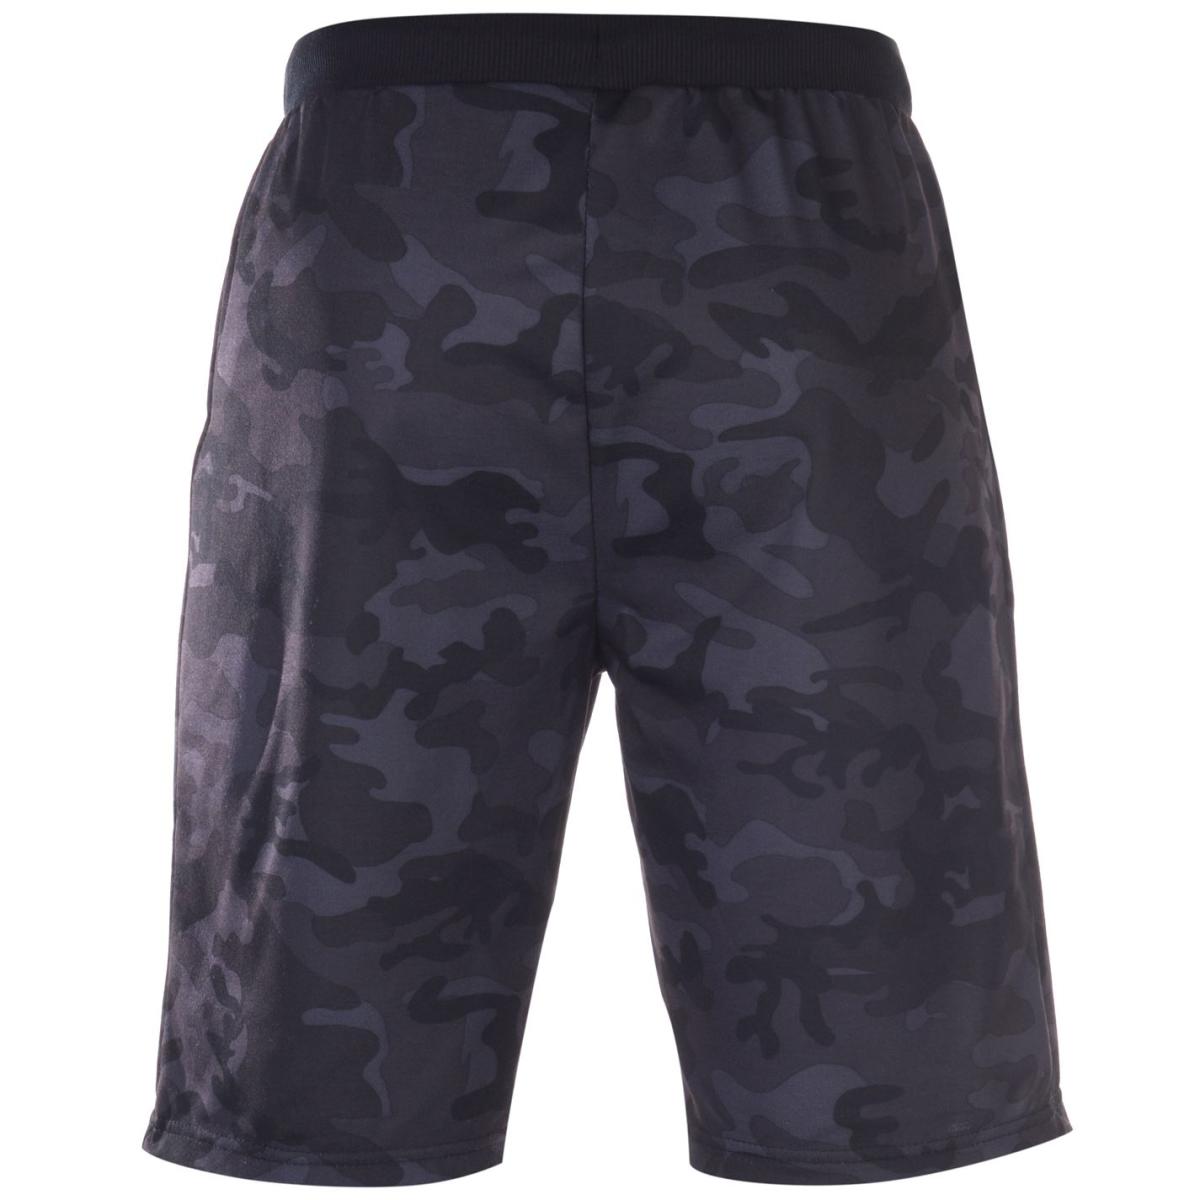 EVERLAST-Uomo-Shorts-Pantaloni-Sportivi-Corti-Bermuda-Pantaloni-Pantaloni-sportivi-6015-Premier miniatura 3